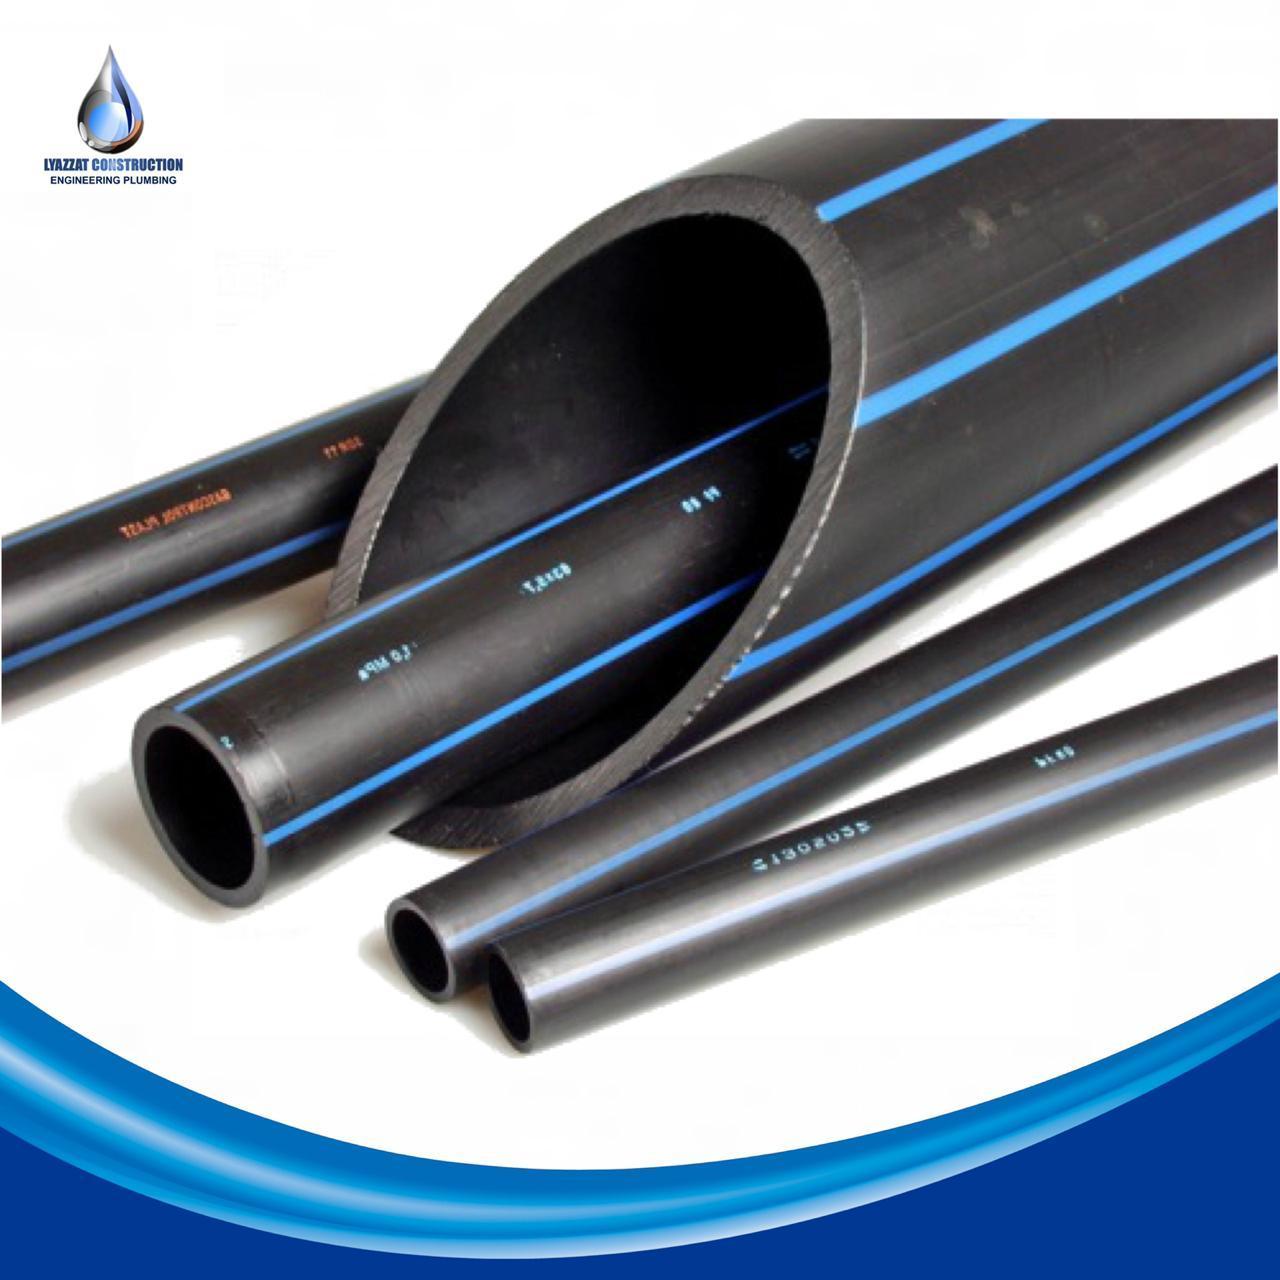 Труба полиэтиленовая ПЭ 100 SDR 13.6 DN 140х10.3